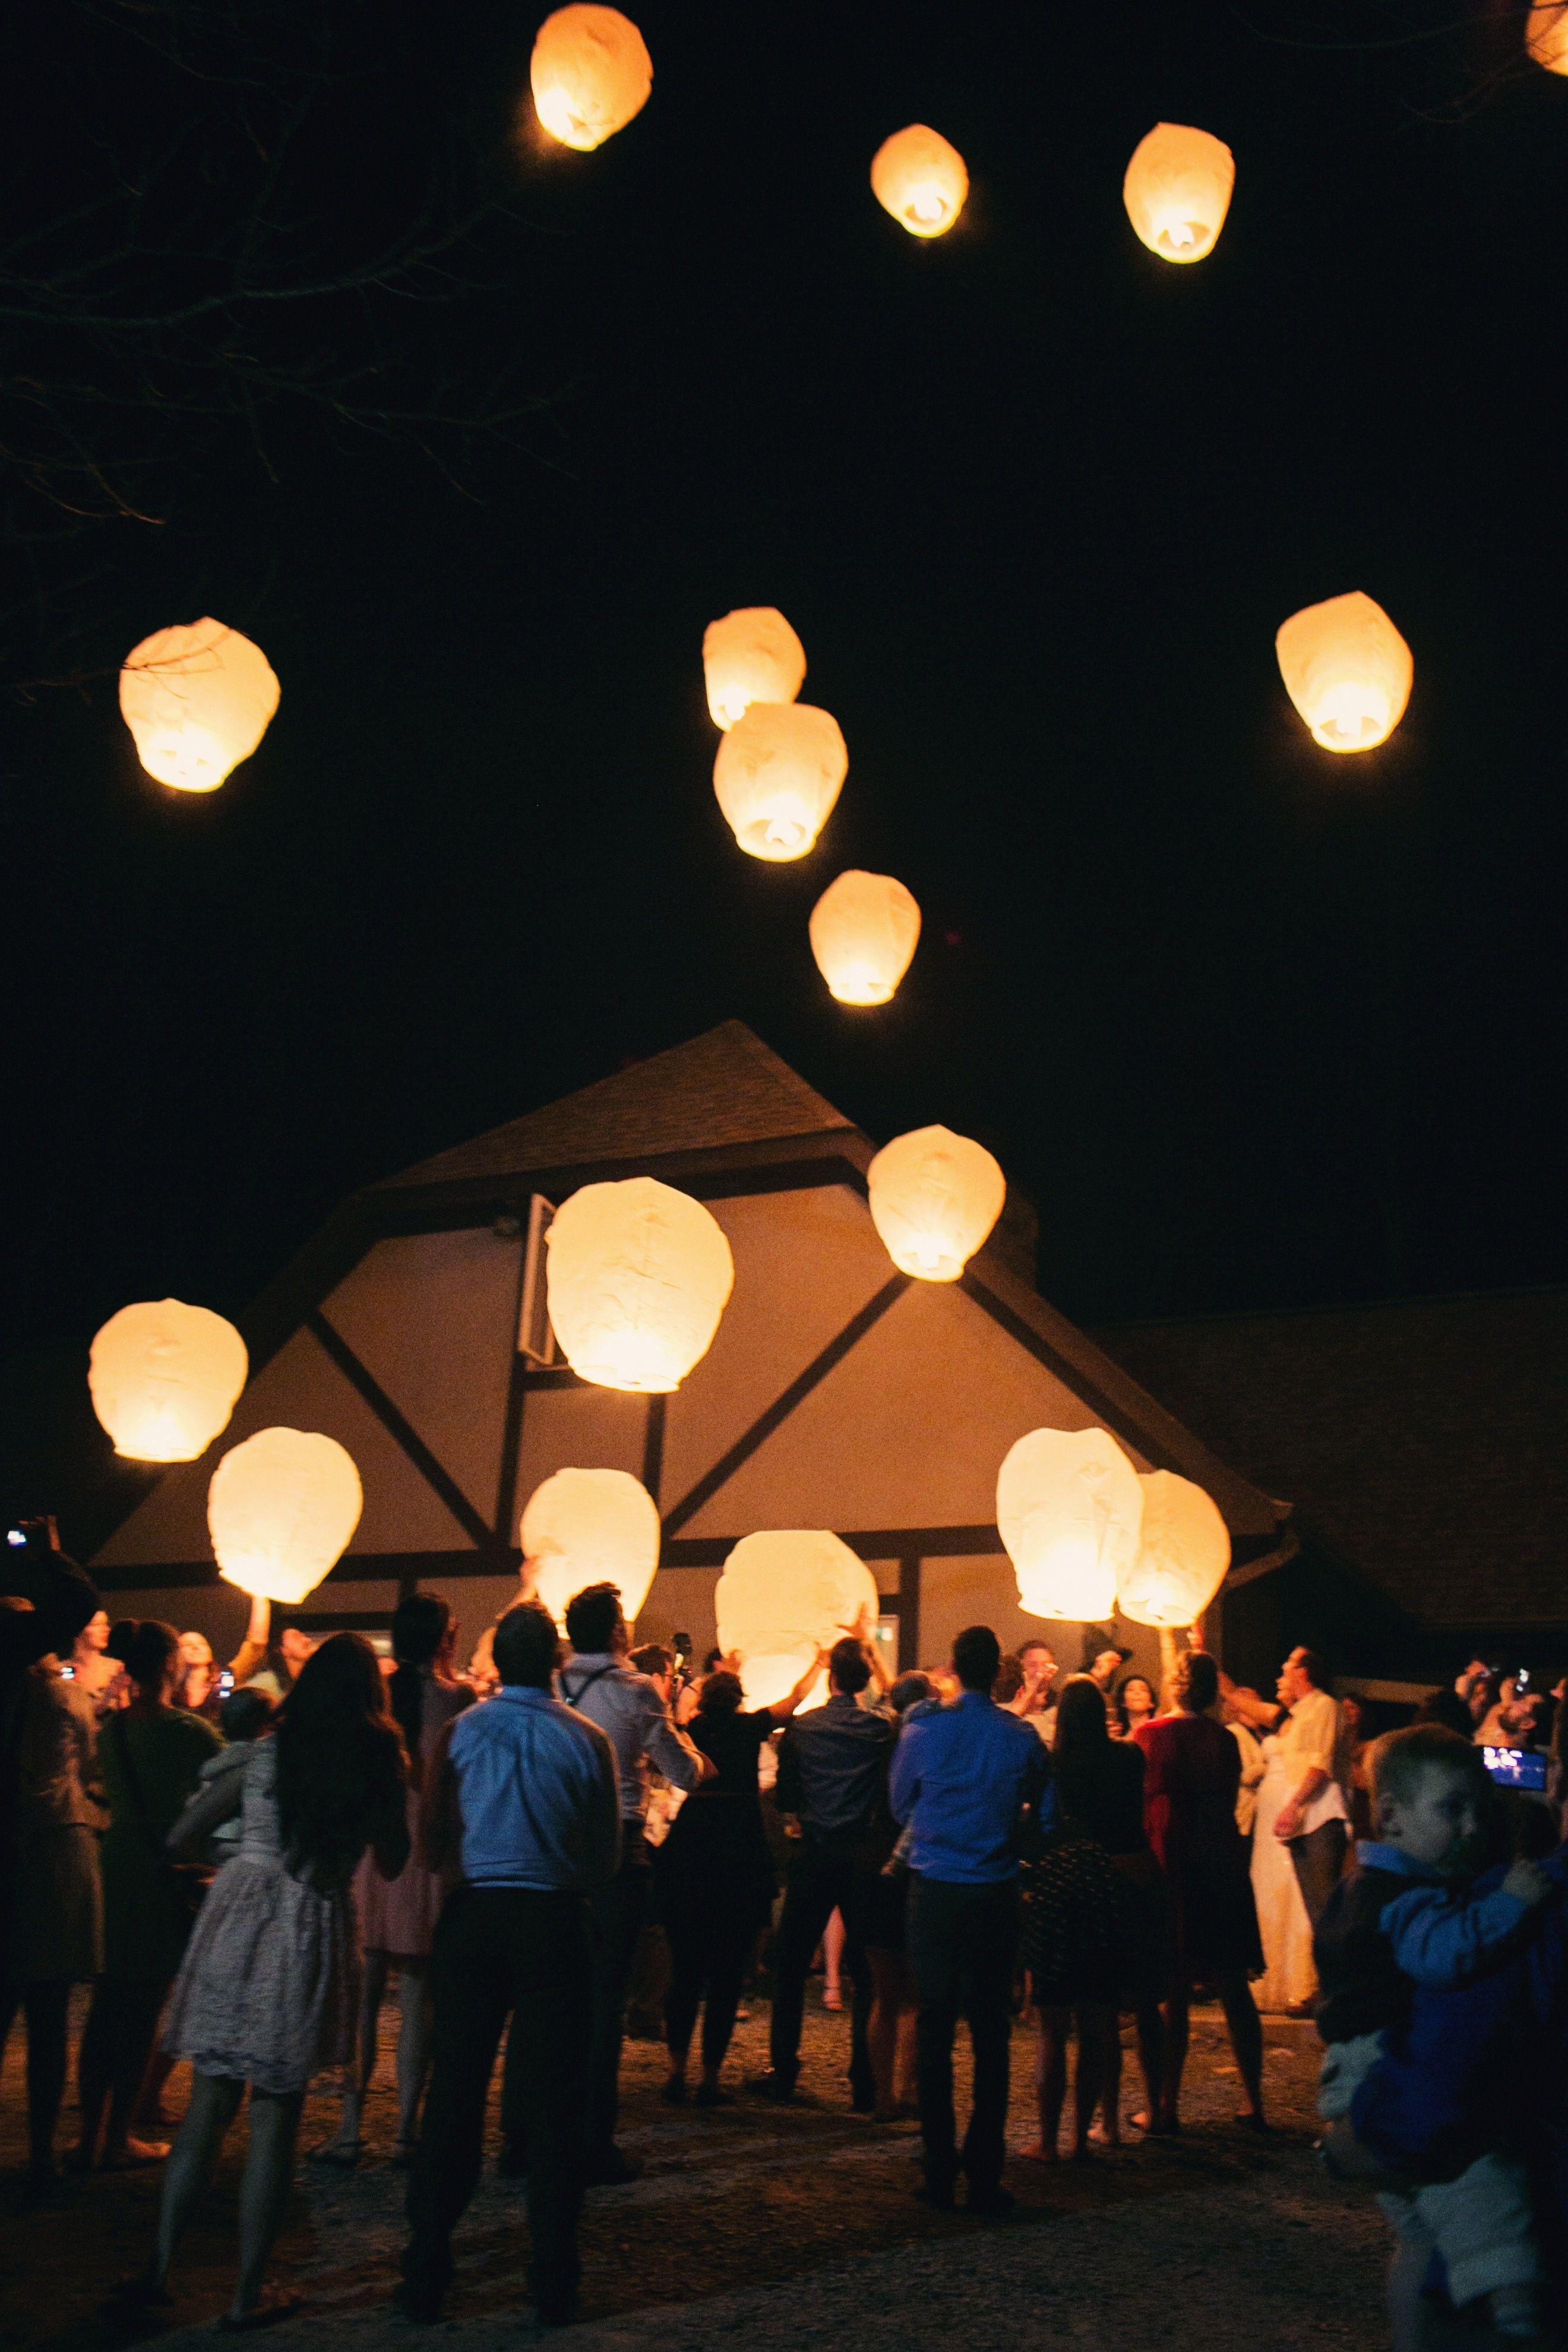 Paper Lantern Release | Ginny Corbett Photography | Theknot.com ... for Paper Lantern Photography  575lpg